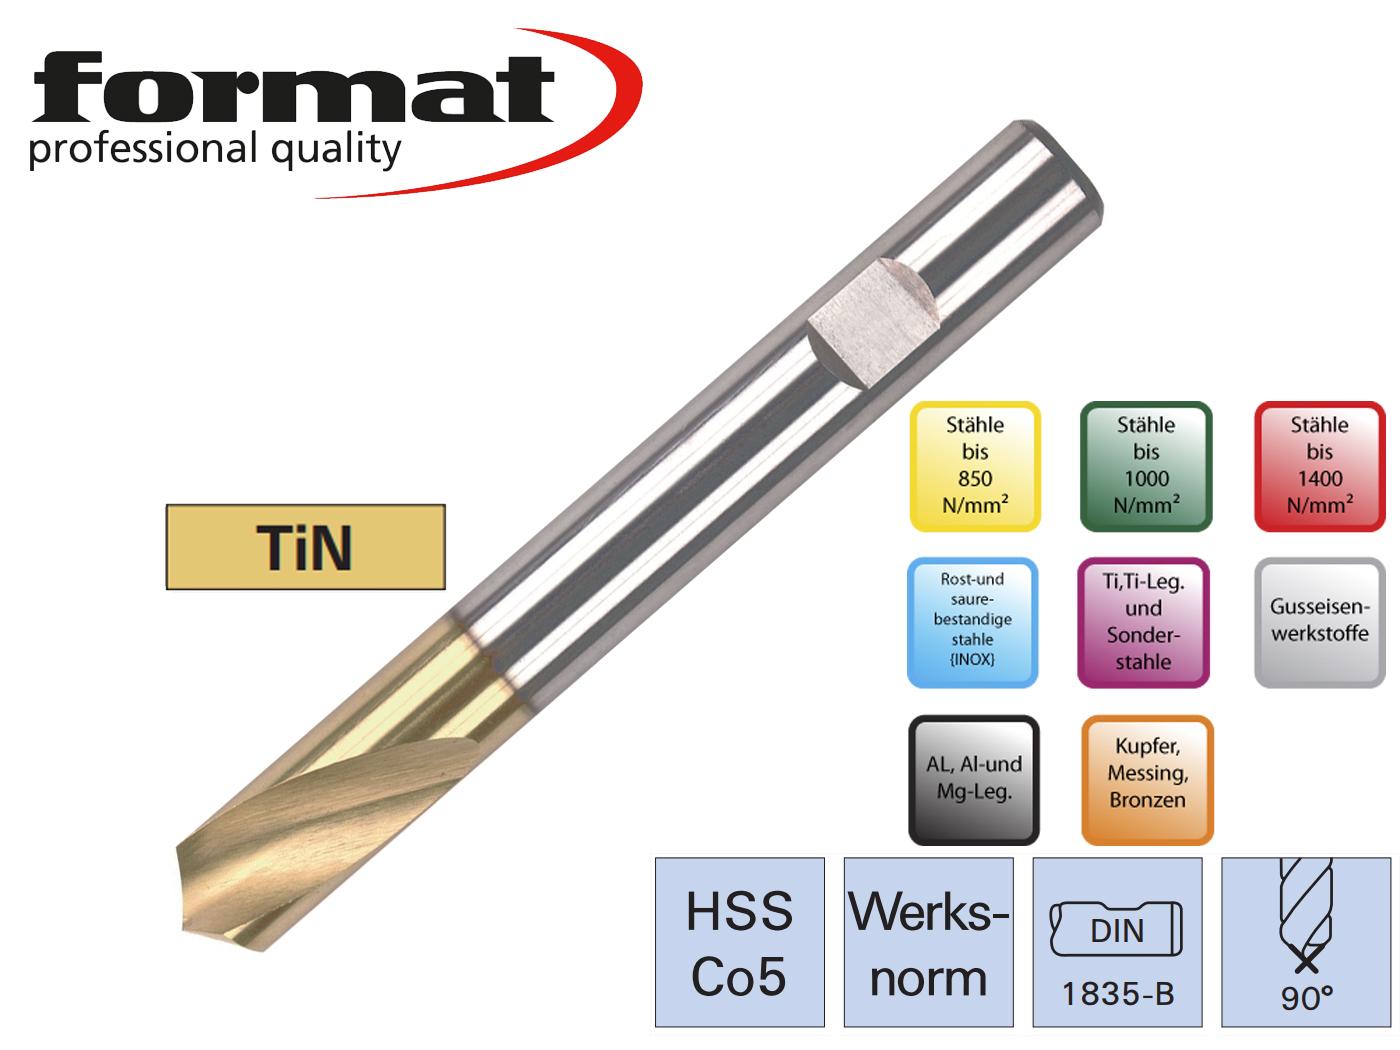 Centerboor NC DIN 1835 B HSSCo5 90G TiN FORMAT | DKMTools - DKM Tools